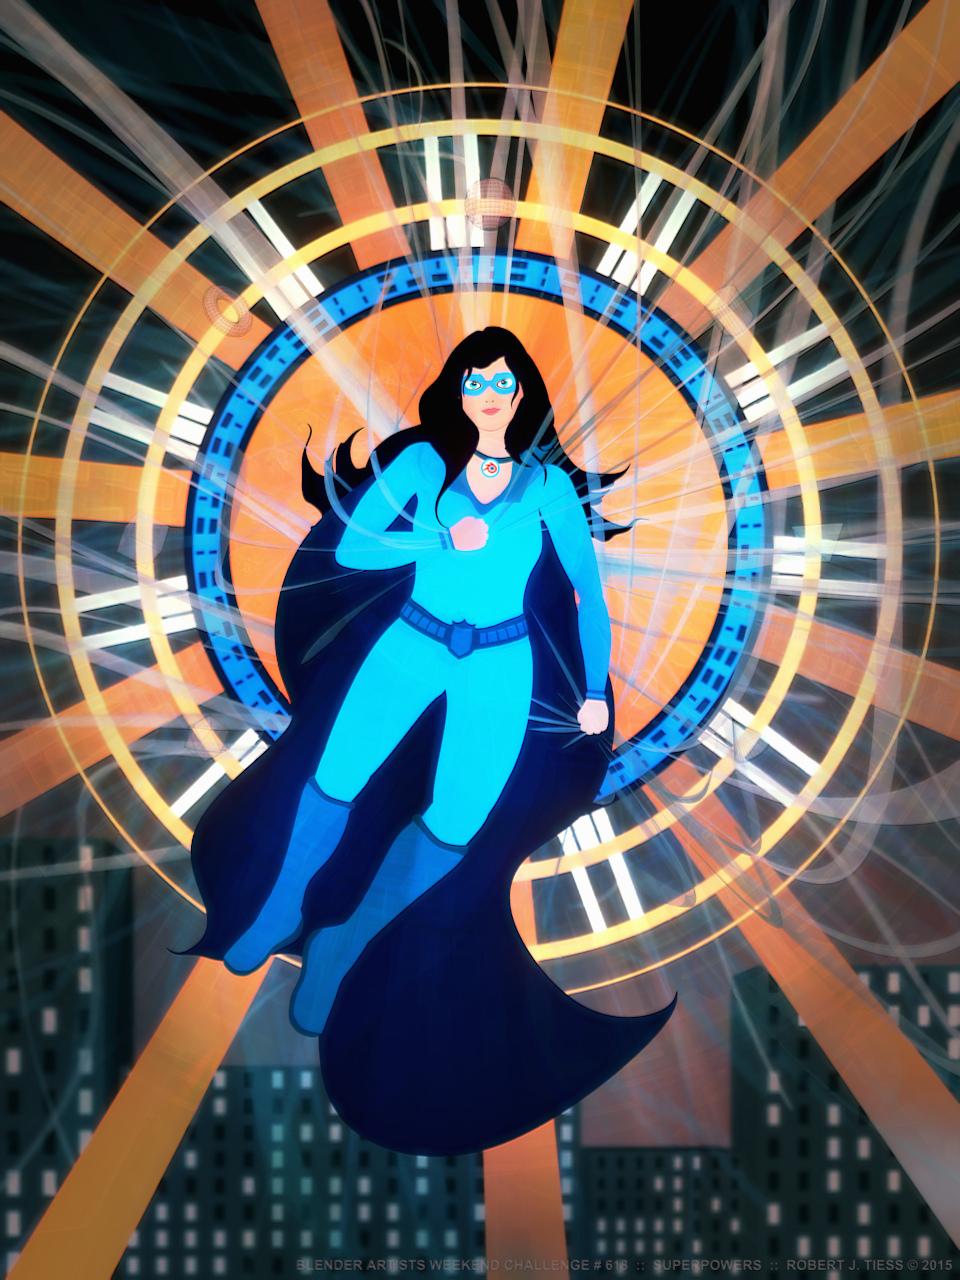 Superpowers - By Robert J. Tiess